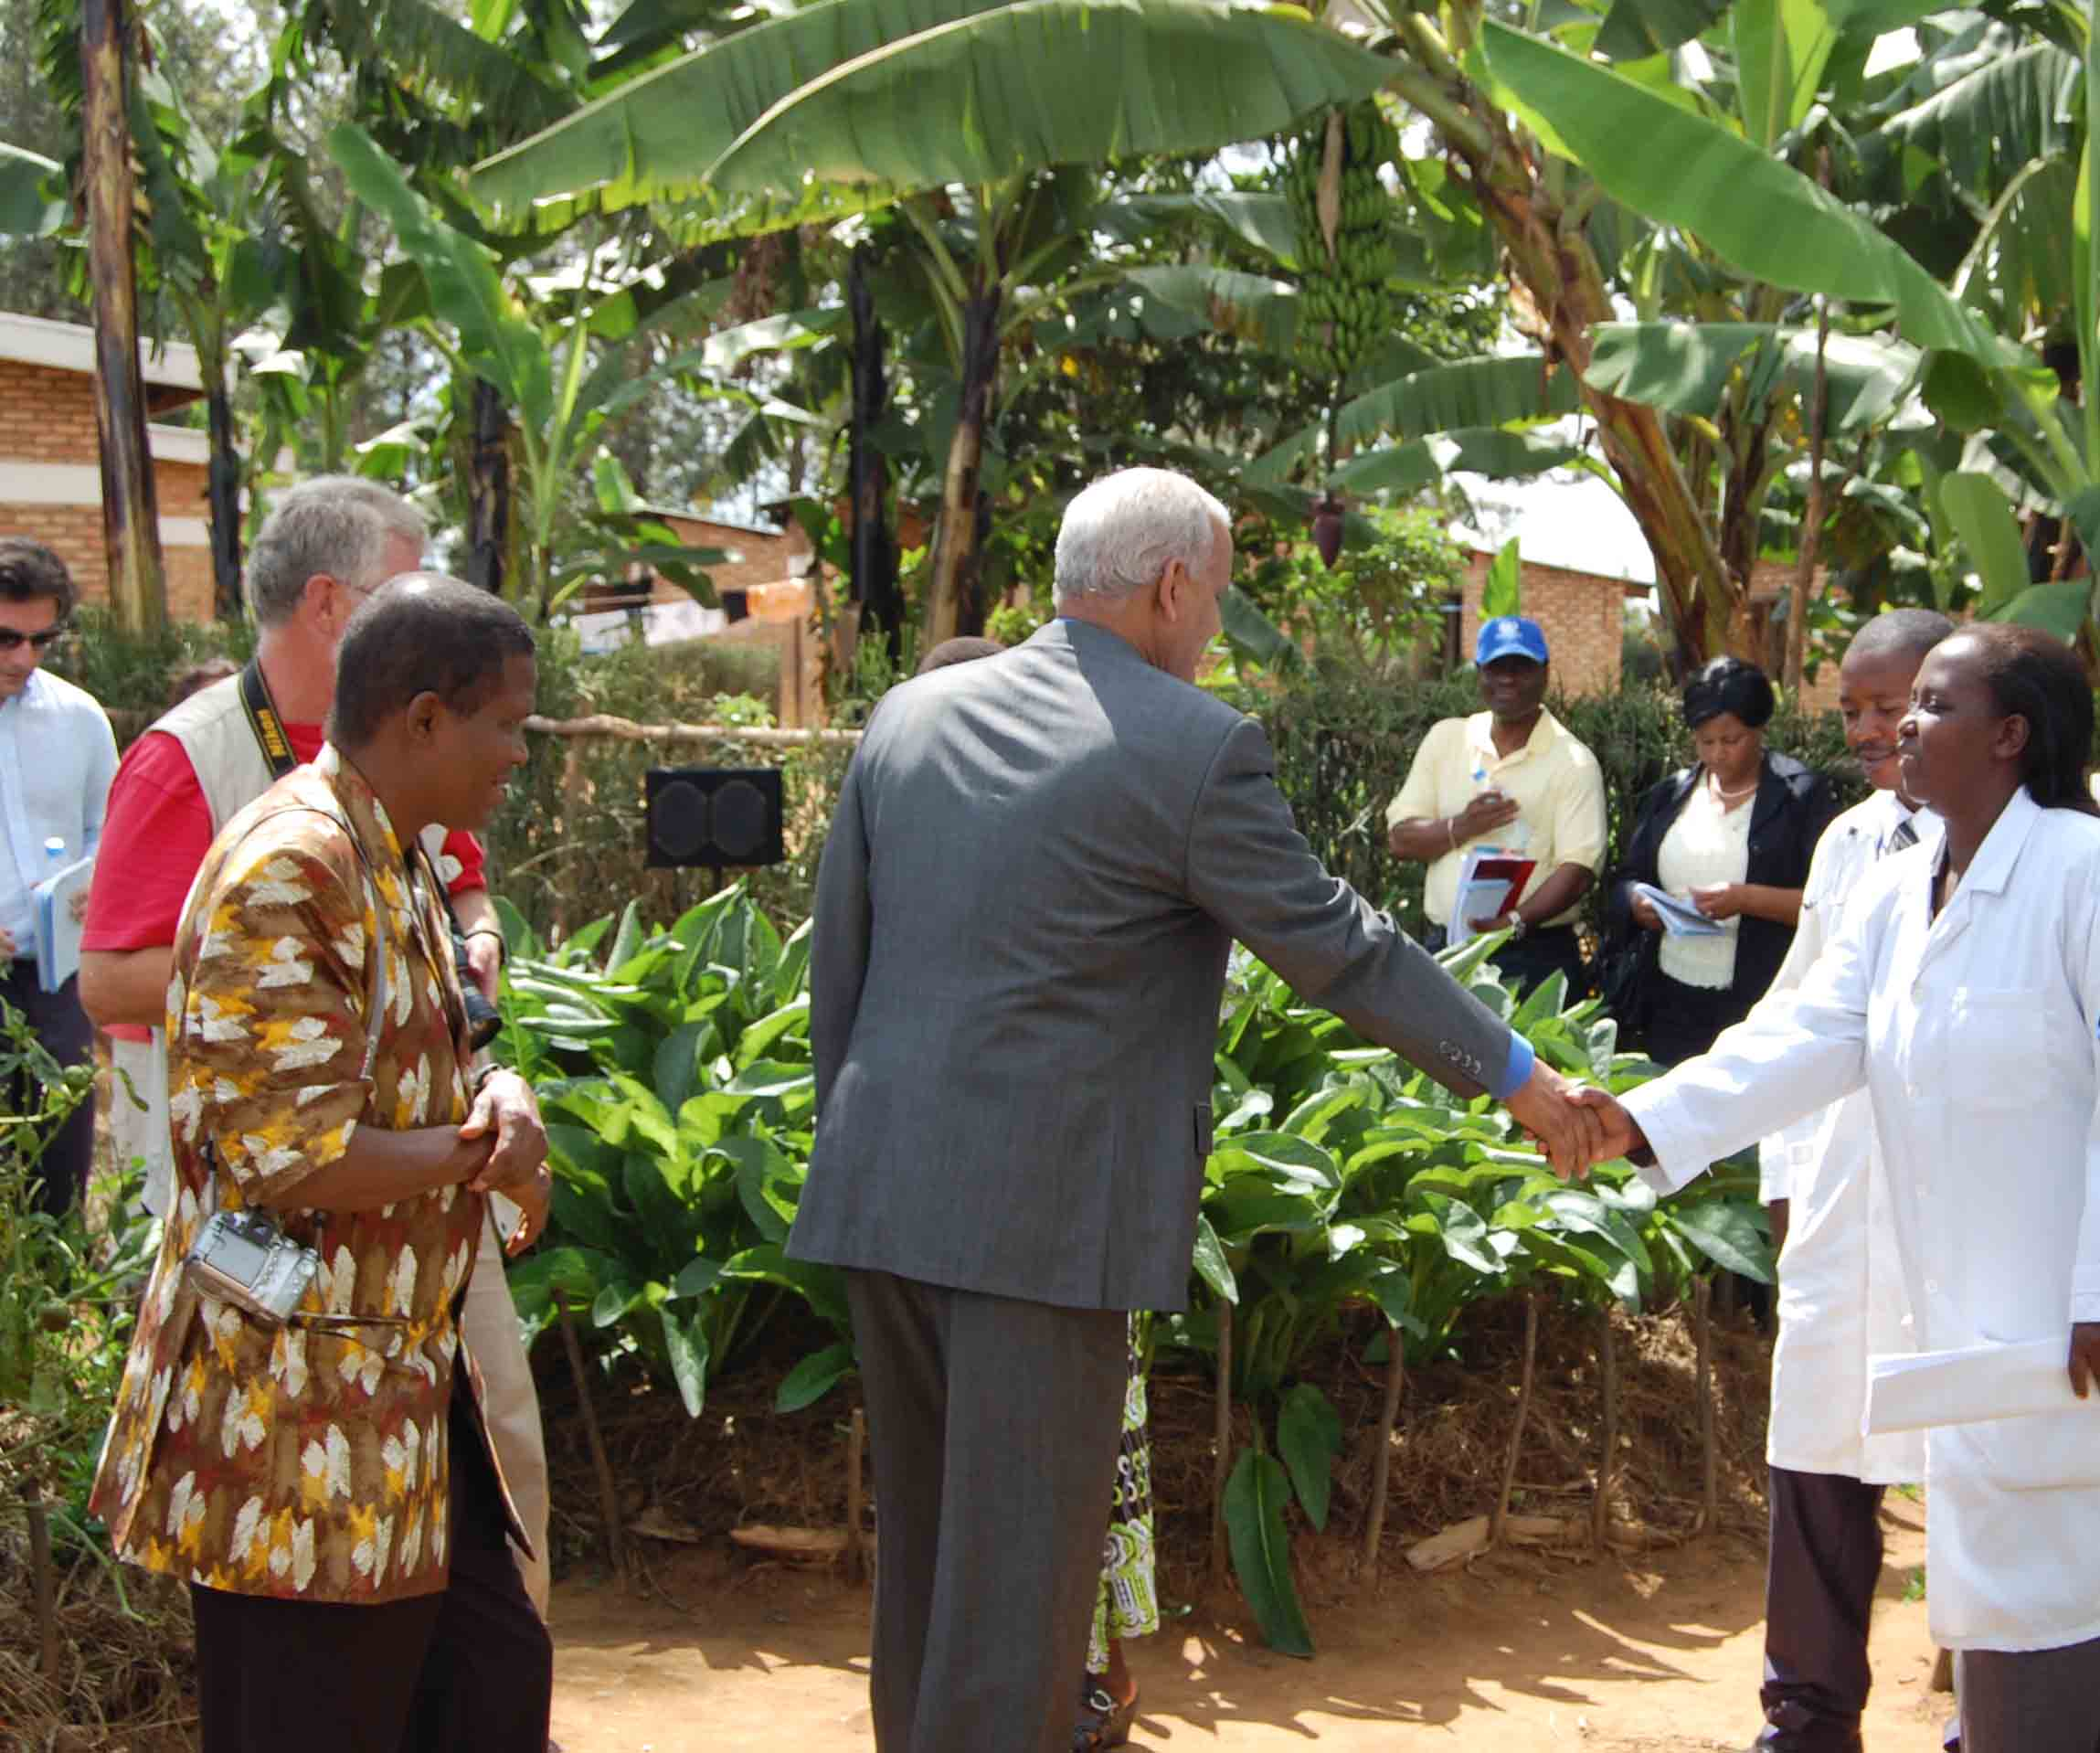 Kitchen Garden Project Unfpa Rwanda Un Governing Bodies Learnt From Rwanda Kitchen